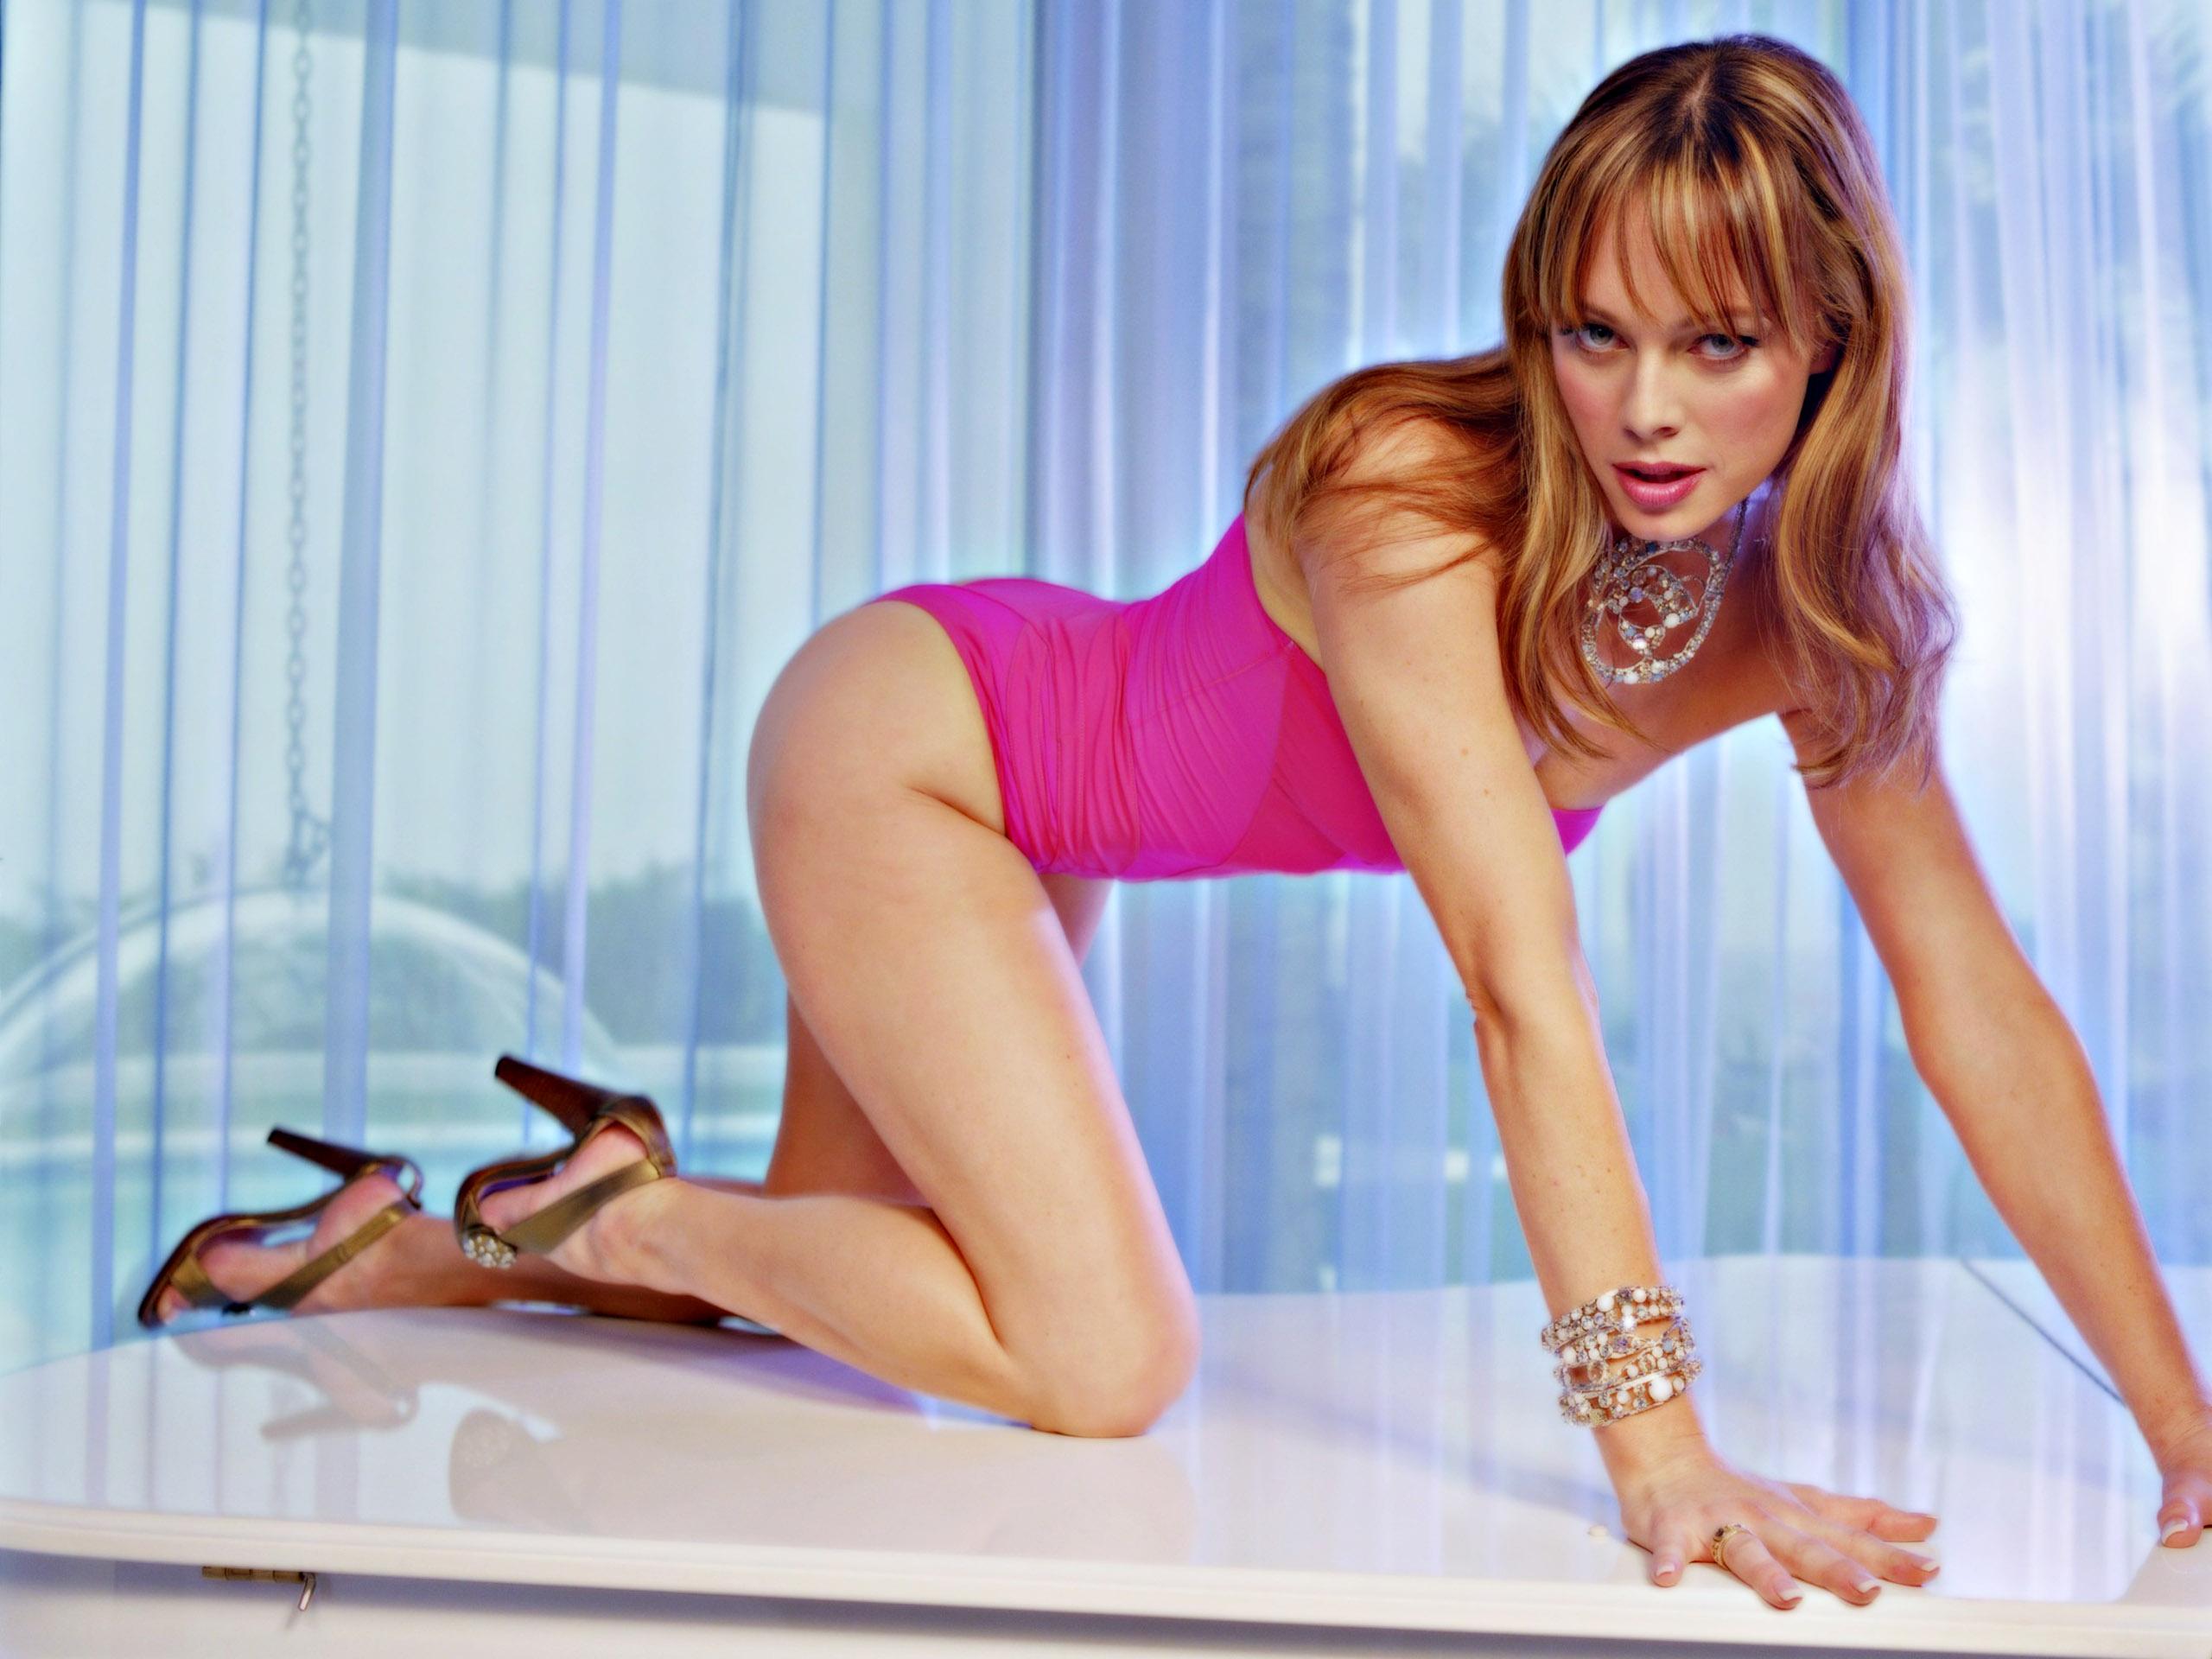 Melinda clarke blowjob, porn movie sodom and gomora